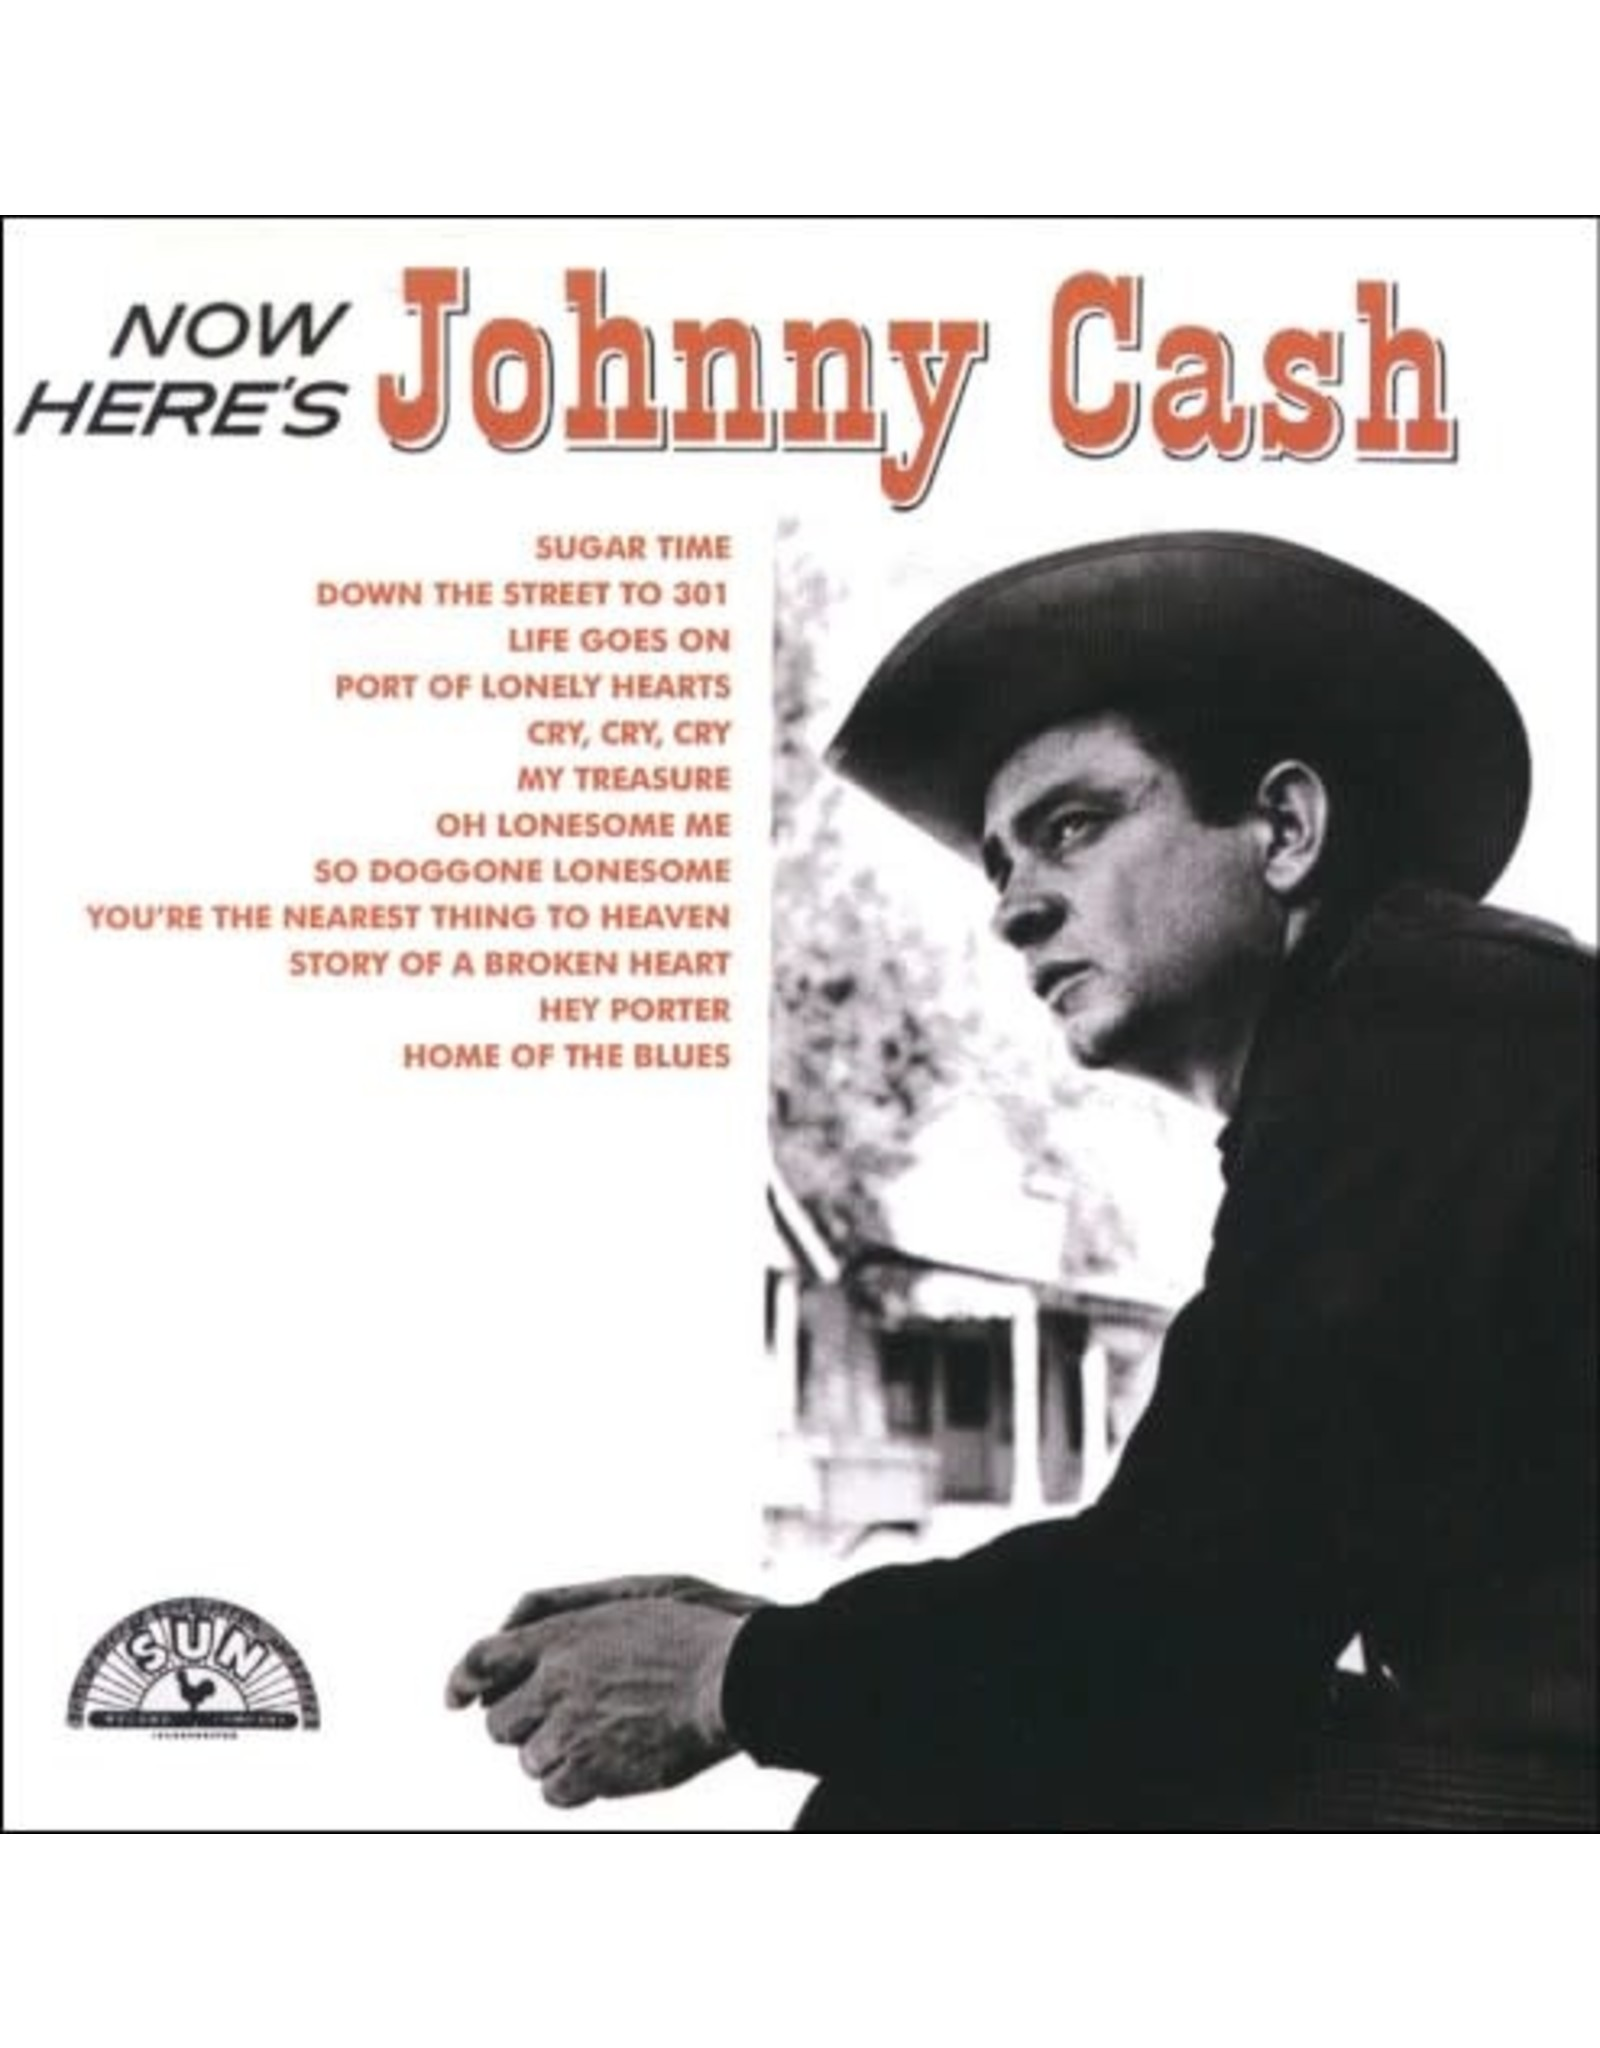 Cash, Johnny - Now Here's Johnny Cash (red vinyl) LP